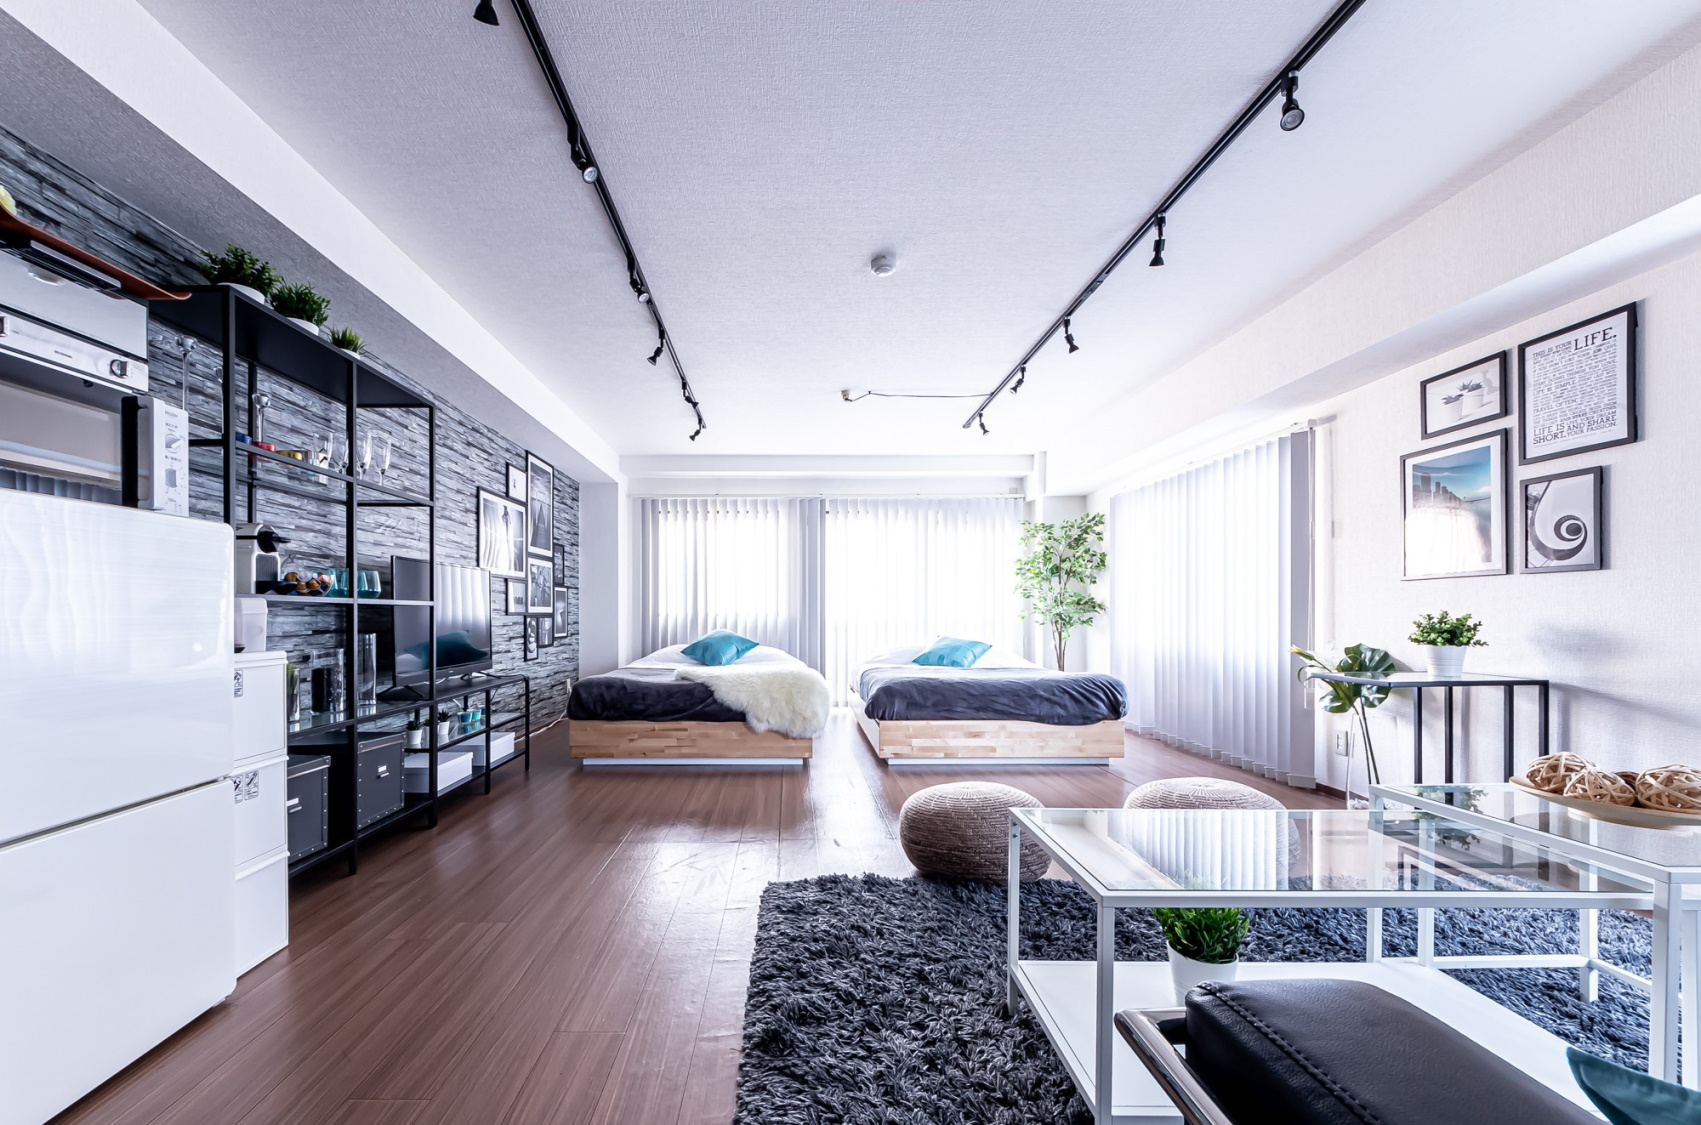 BOAMAX B6/民泊【Vacation STAY提供】の施設画像